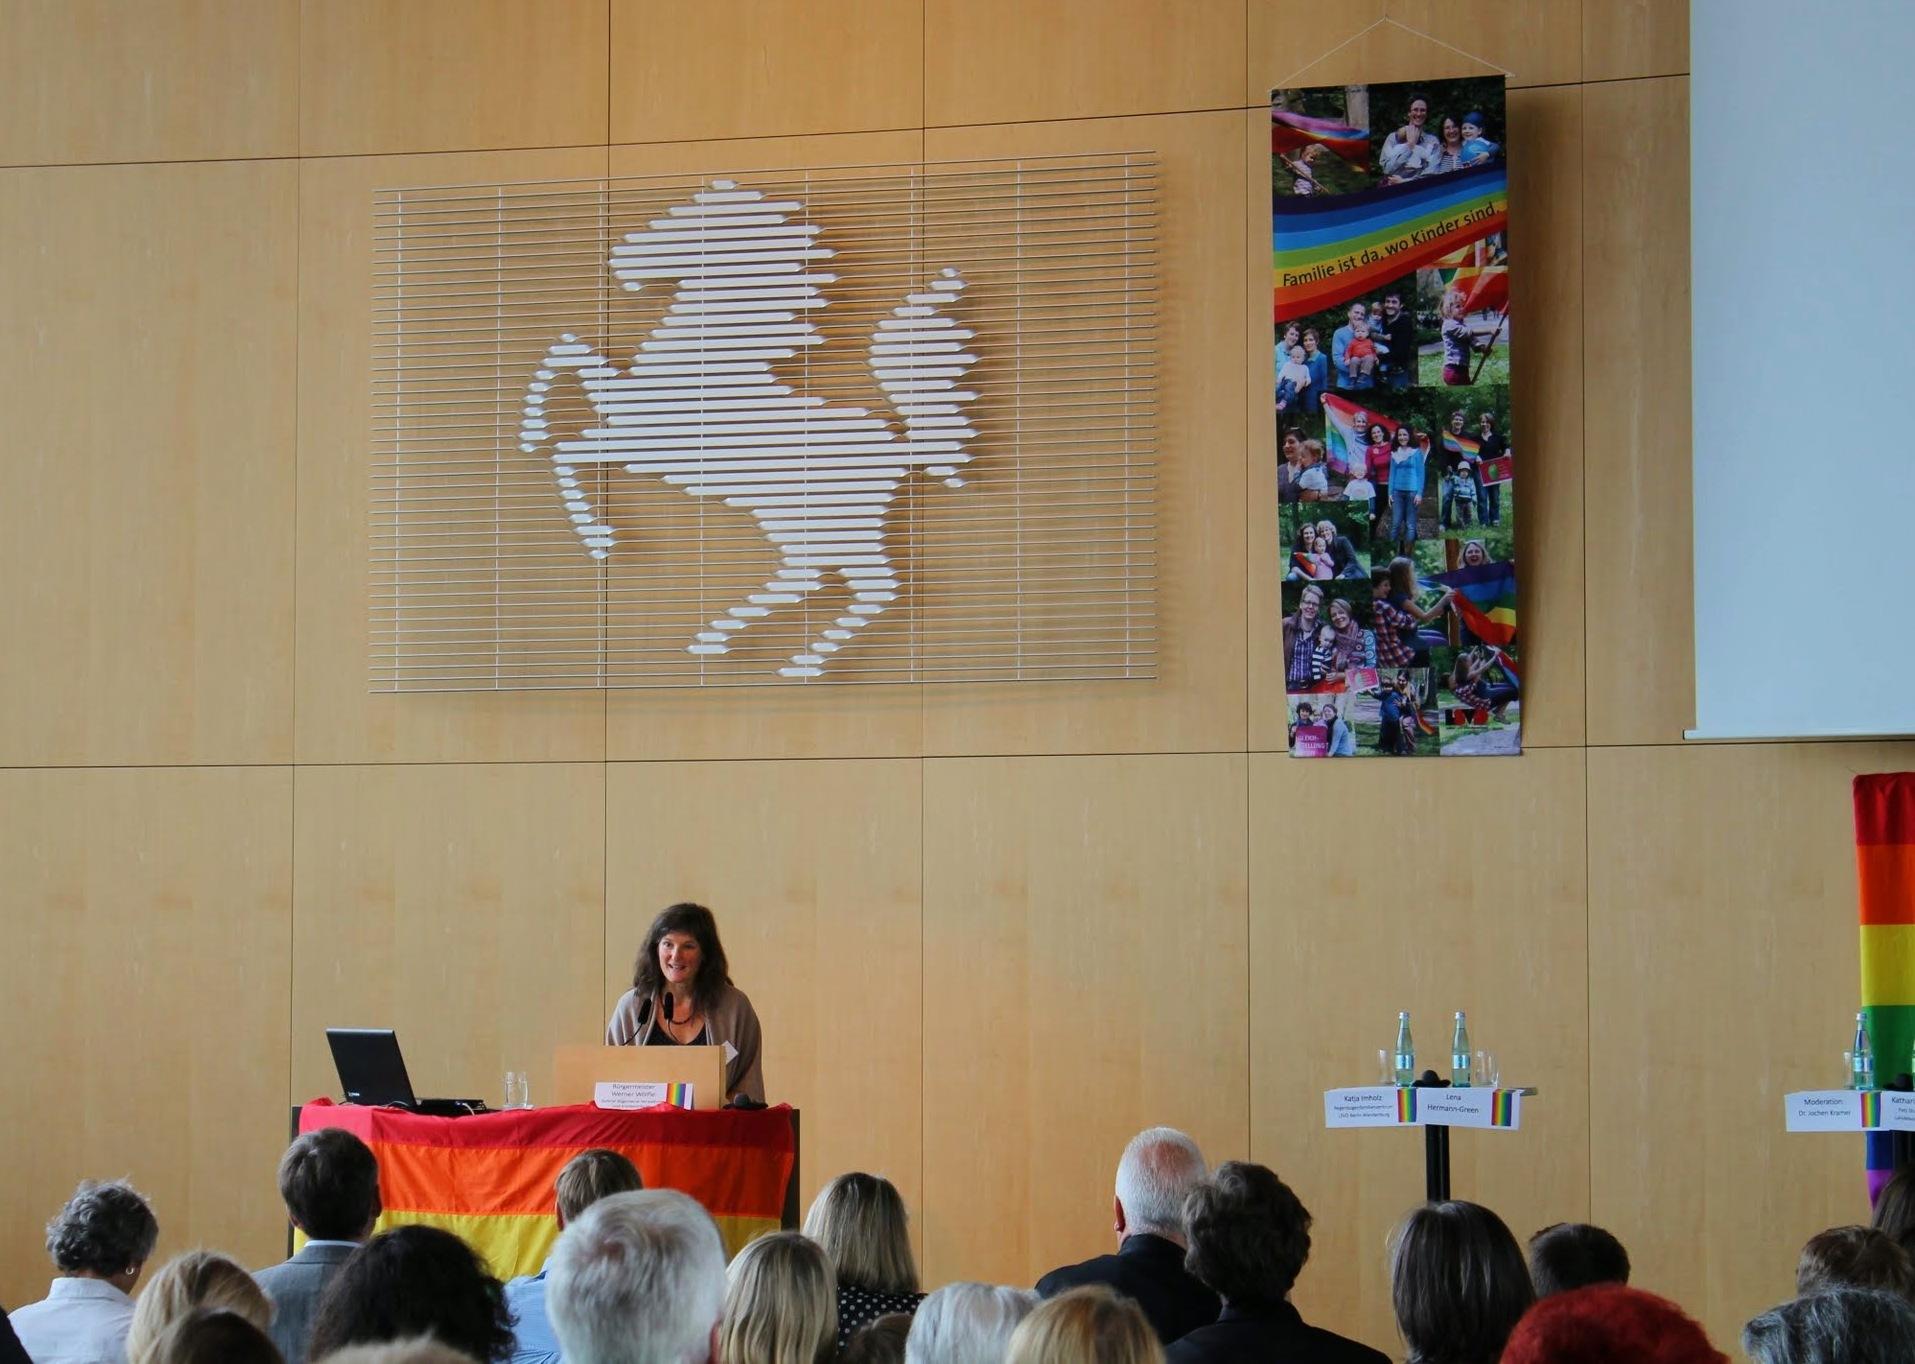 Regenbogenfamilientag Stuttgart 2014